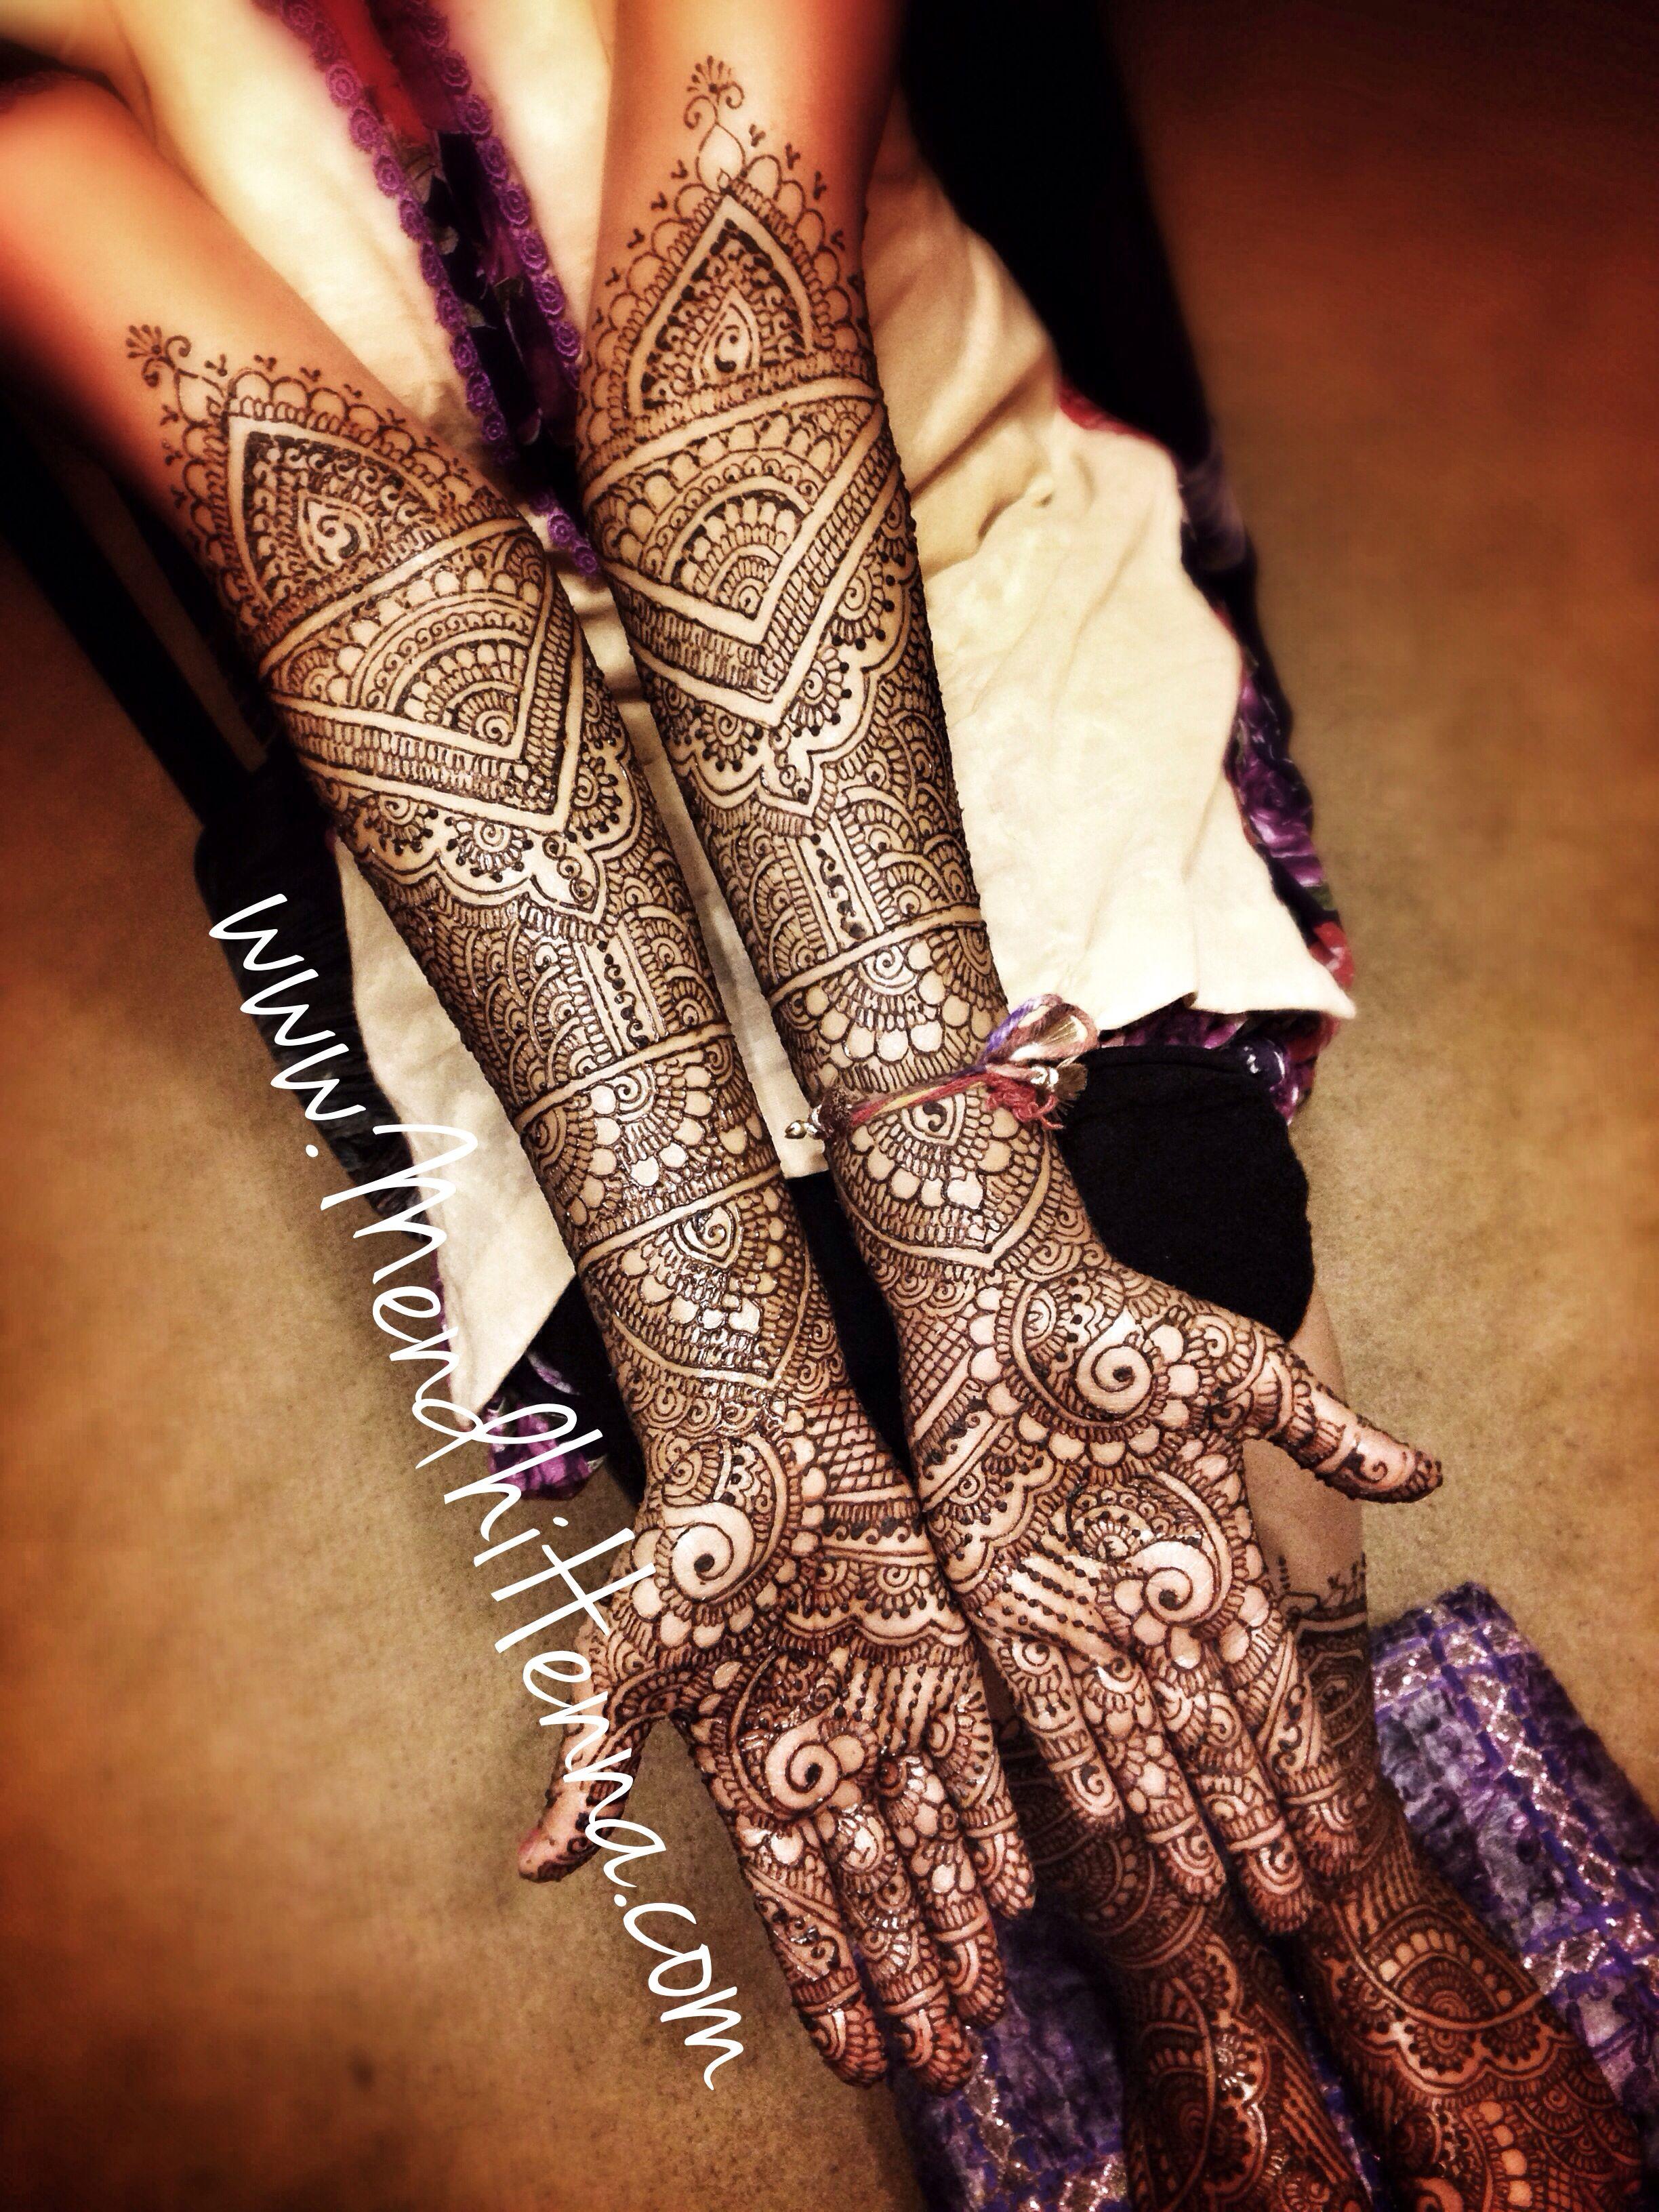 Mendhi Design For An Indian Wedding Desi Bridal Henna Henna